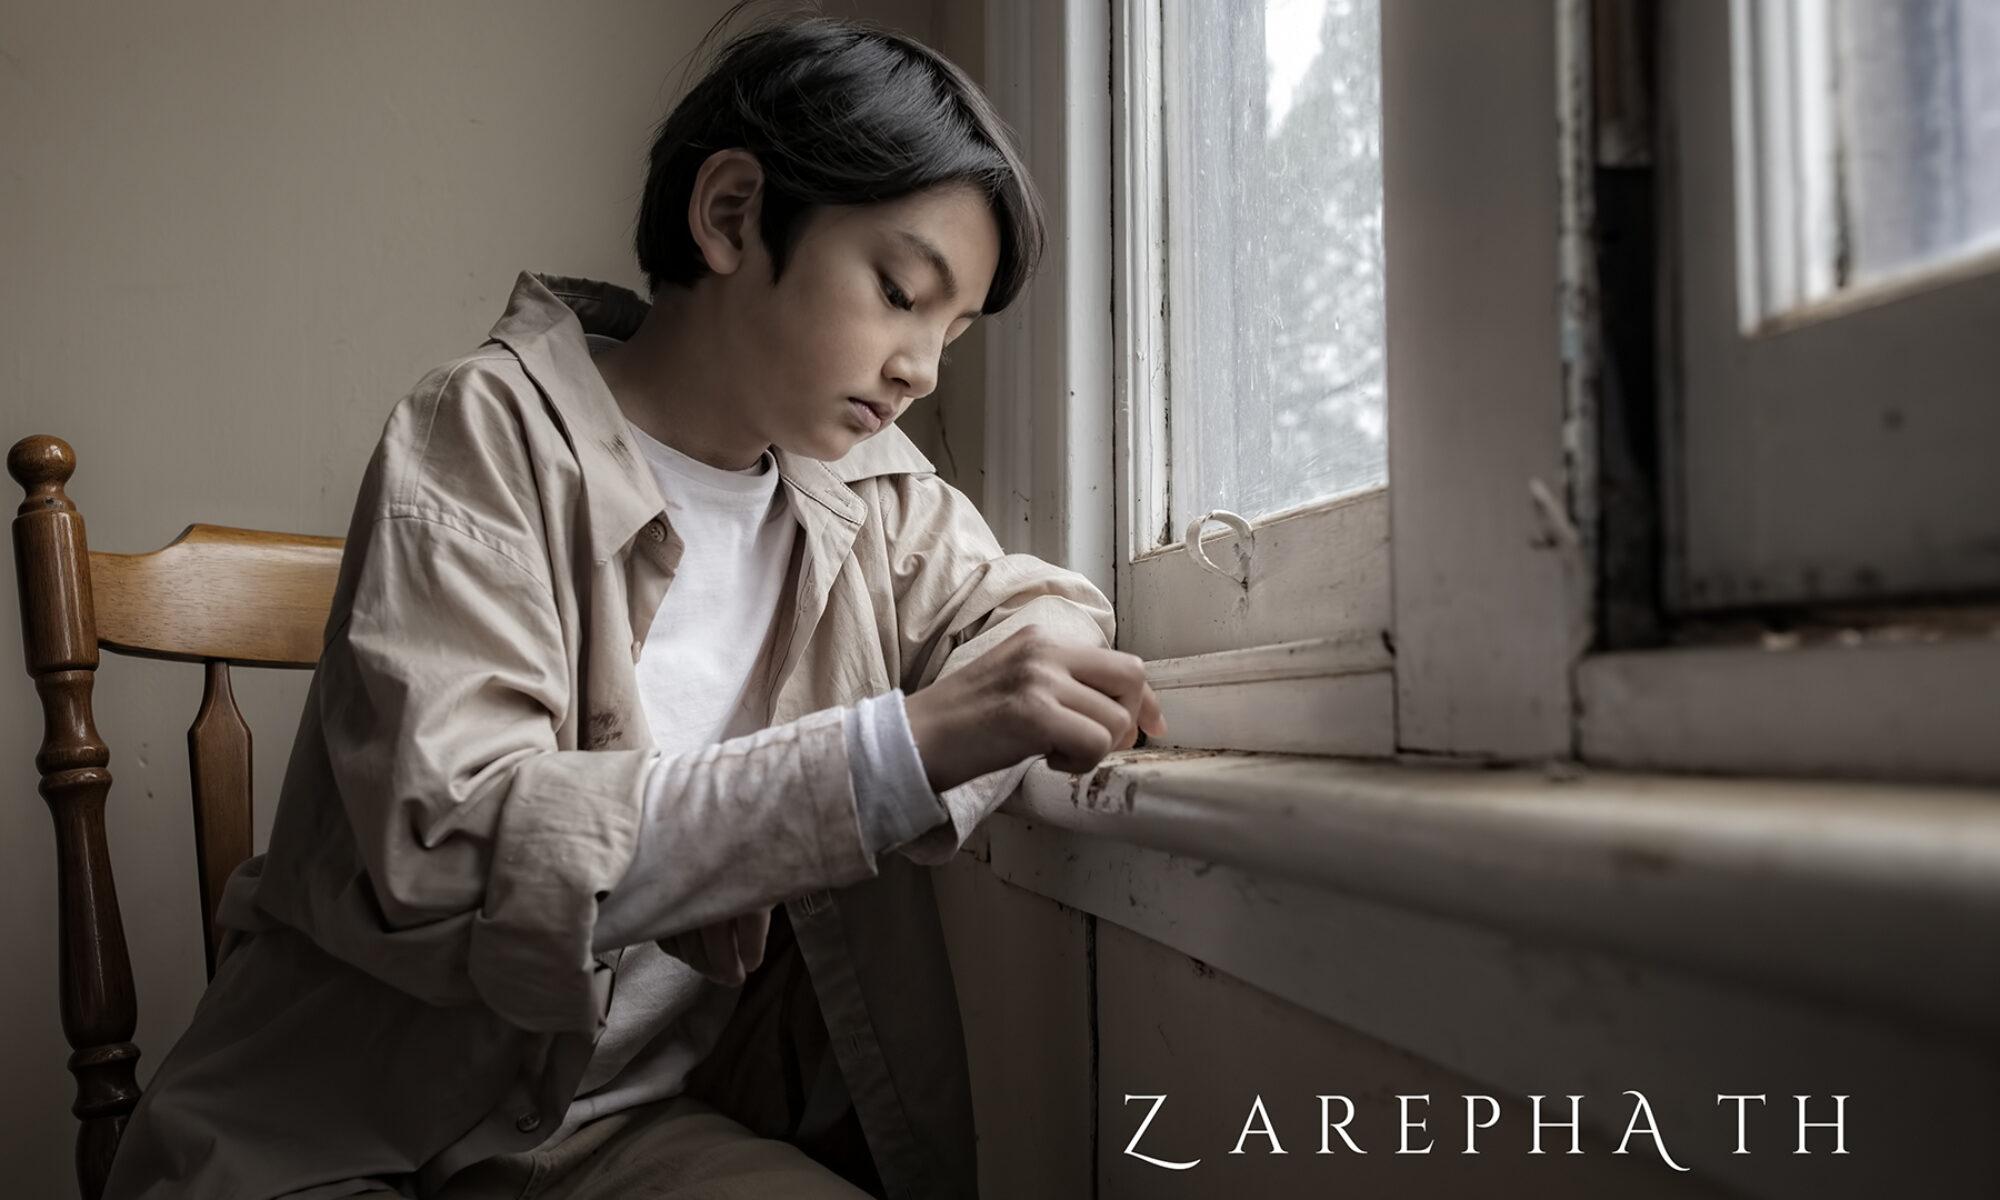 Zarephath